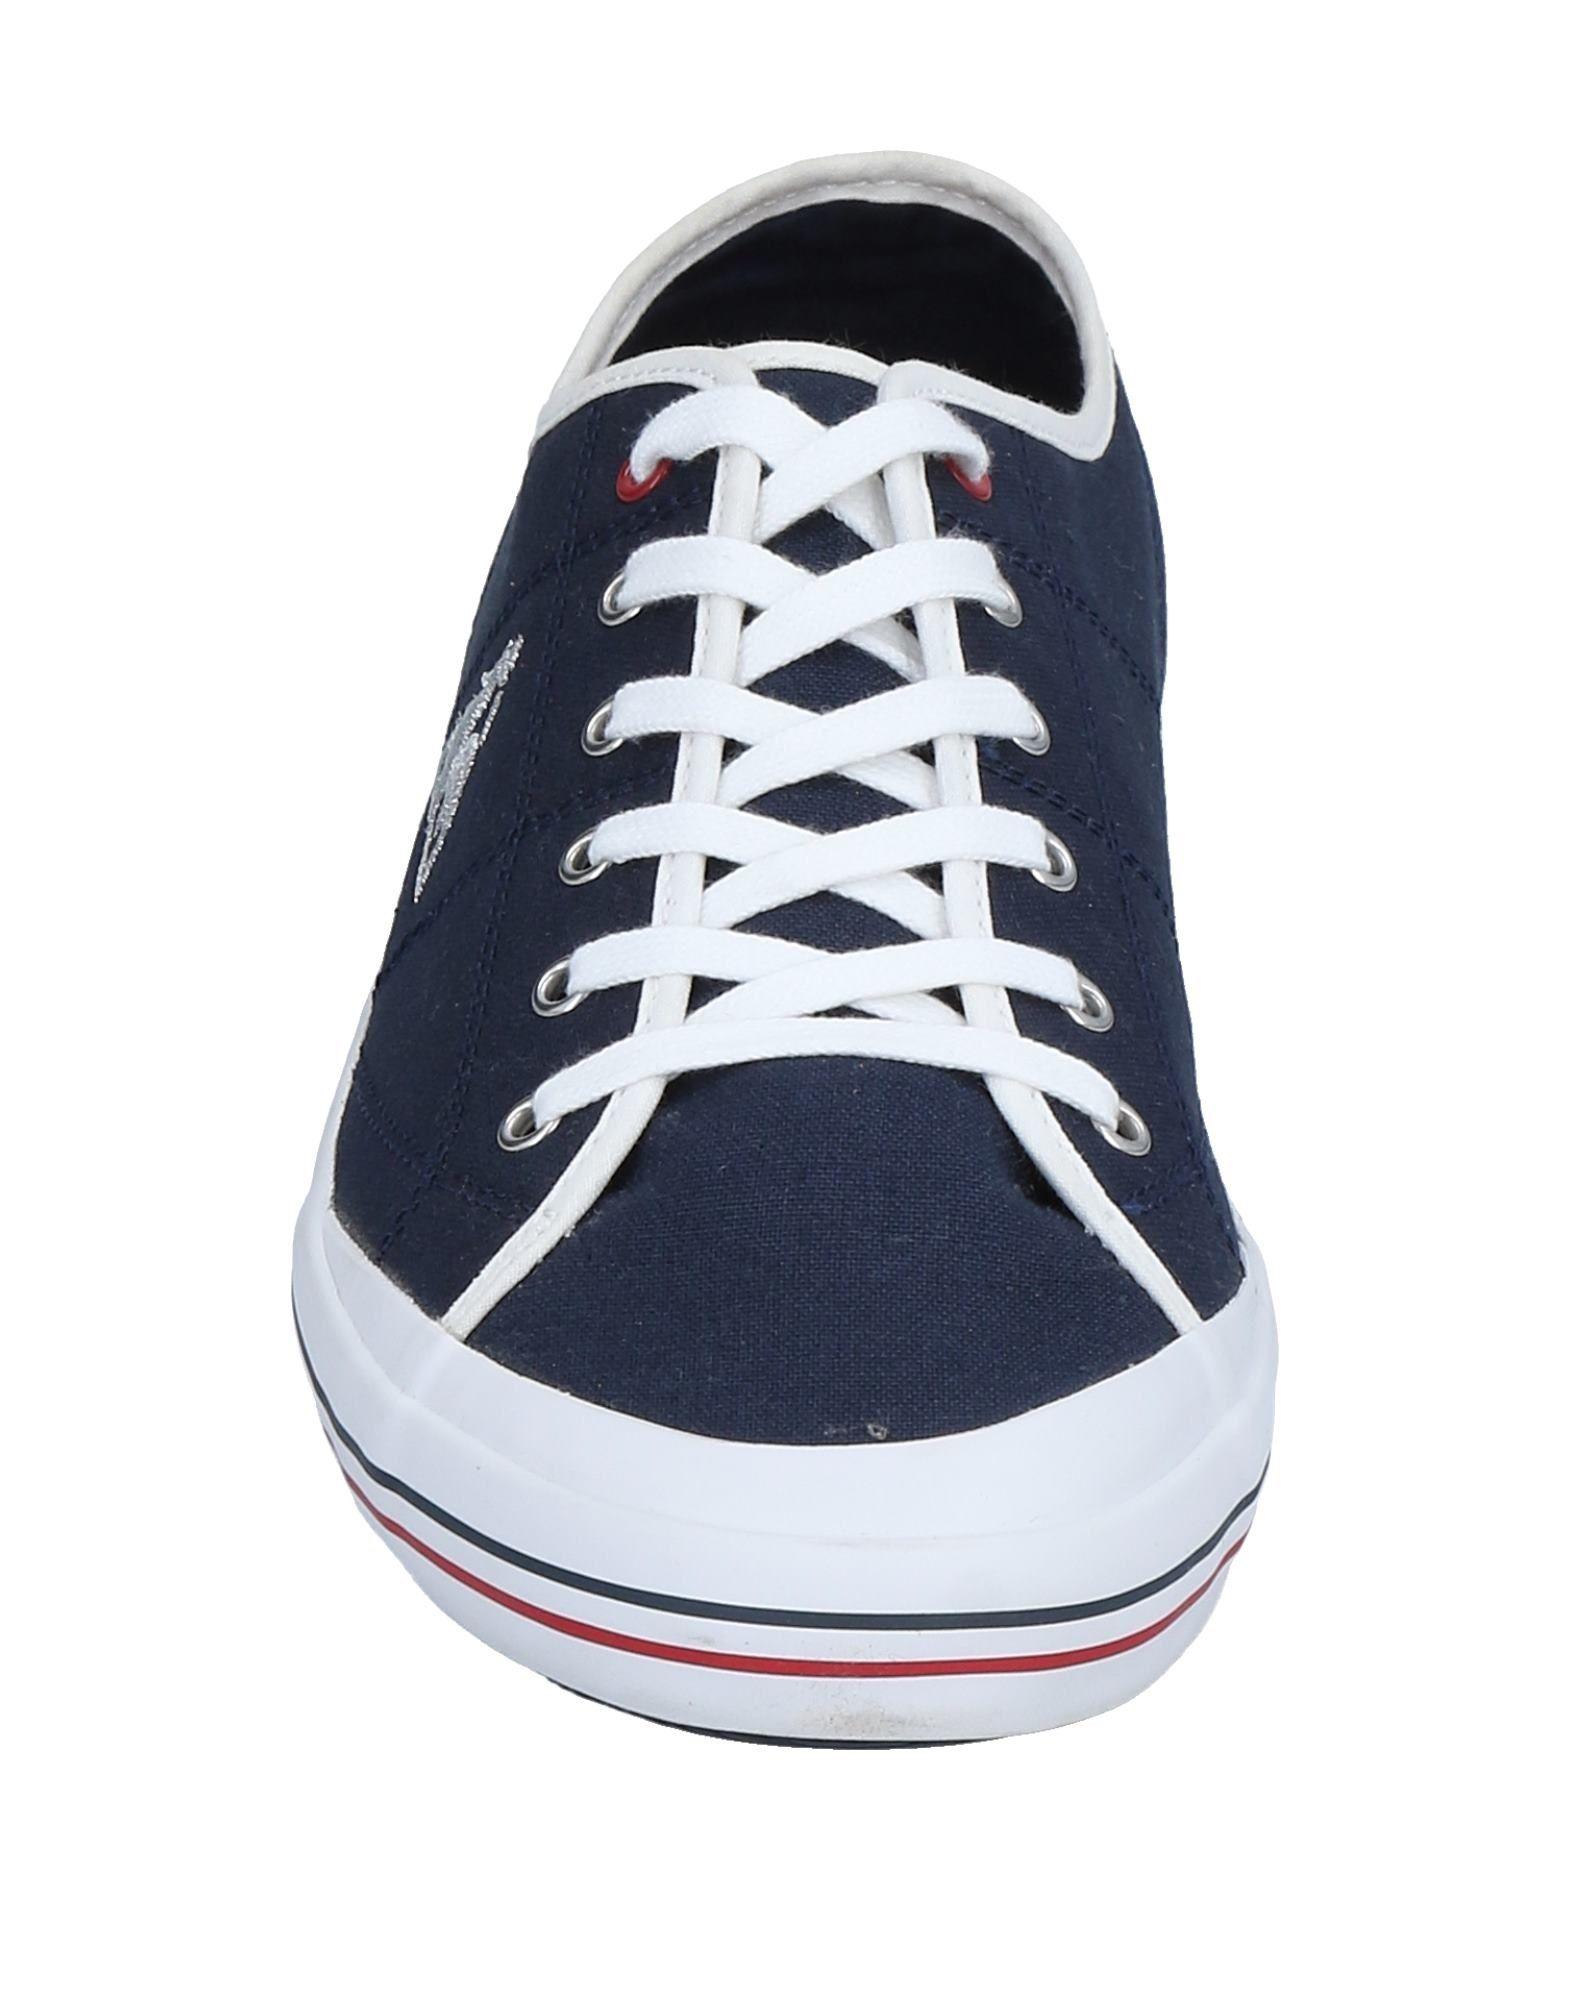 Rabatt Sportif echte Schuhe Le Coq Sportif Rabatt Sneakers Herren  11534341XO e77245